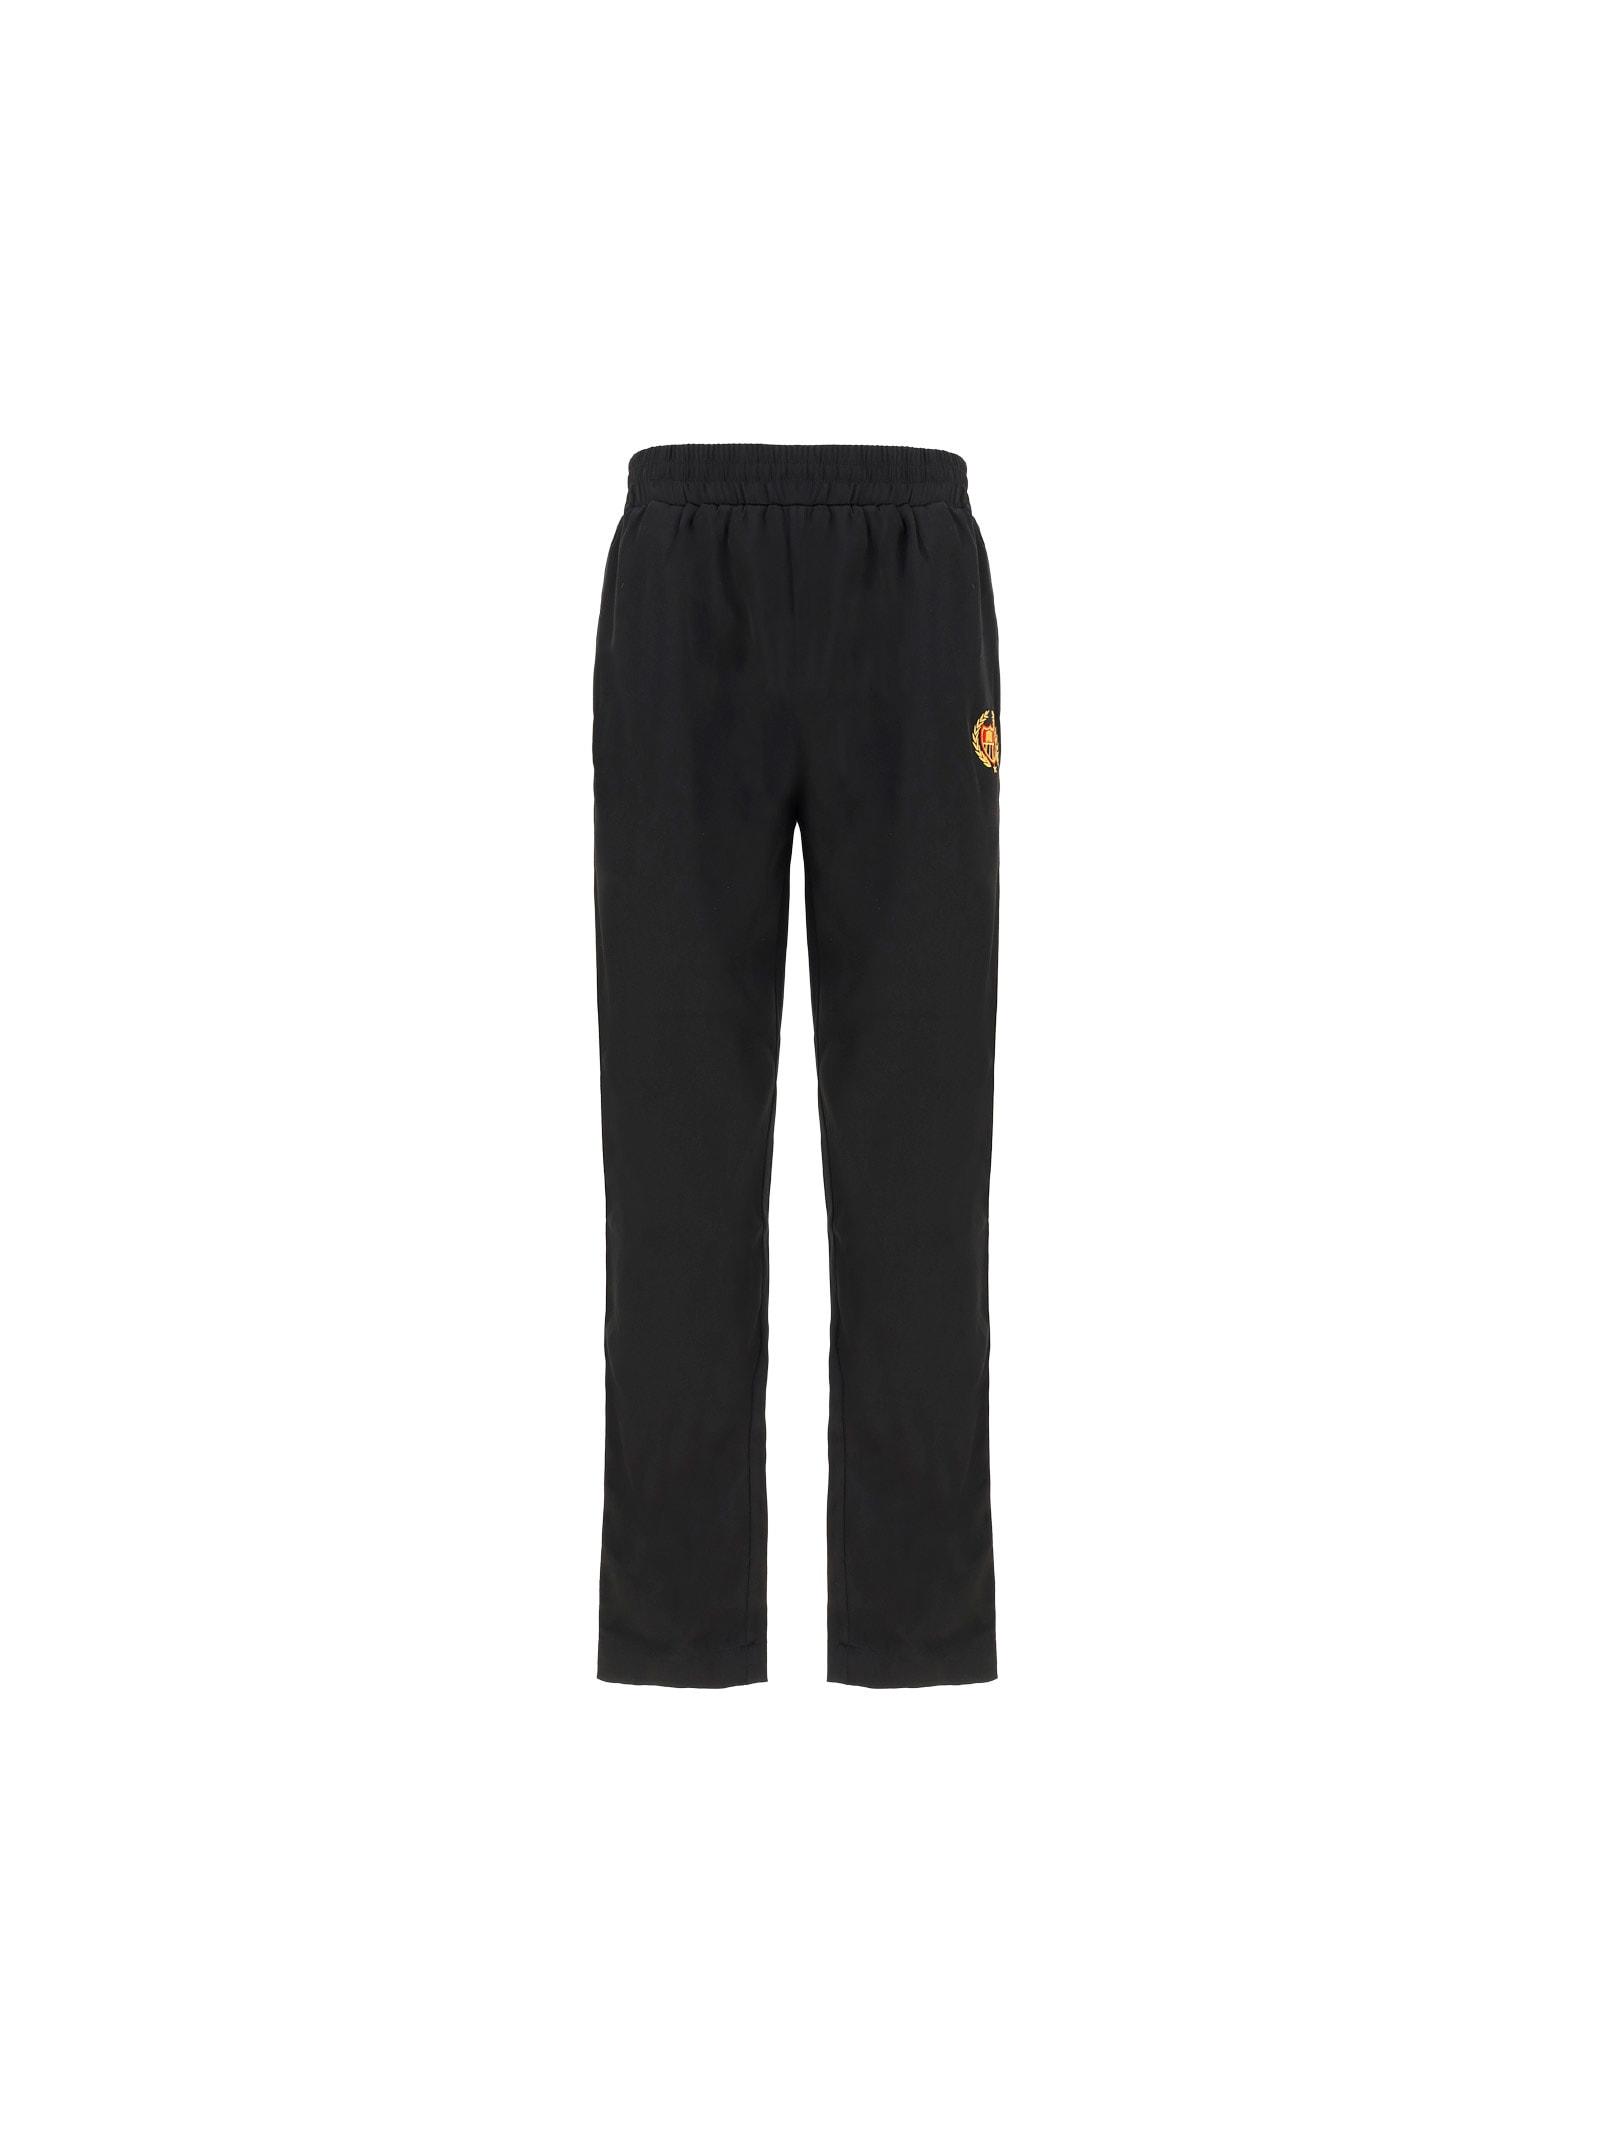 Bel Air Athletics Pants